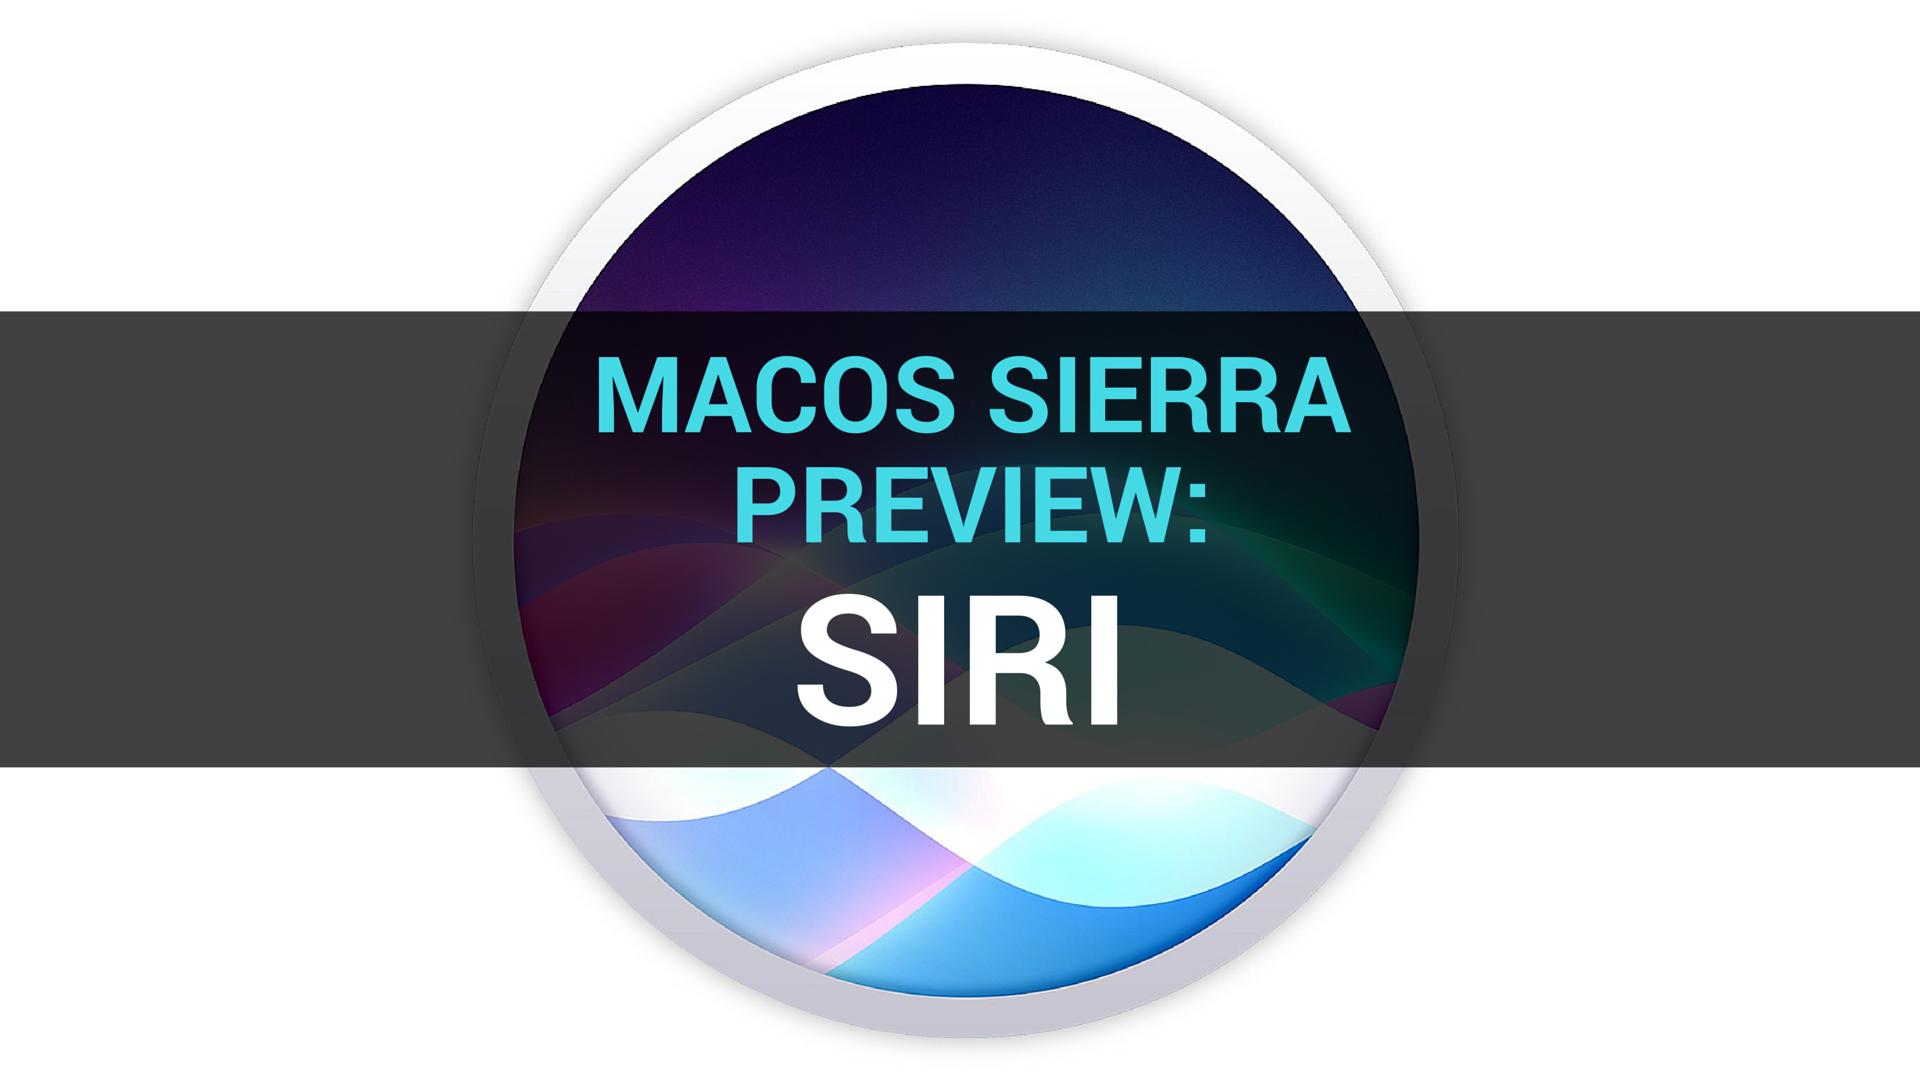 macOS Sierra preview Siri teaser 001